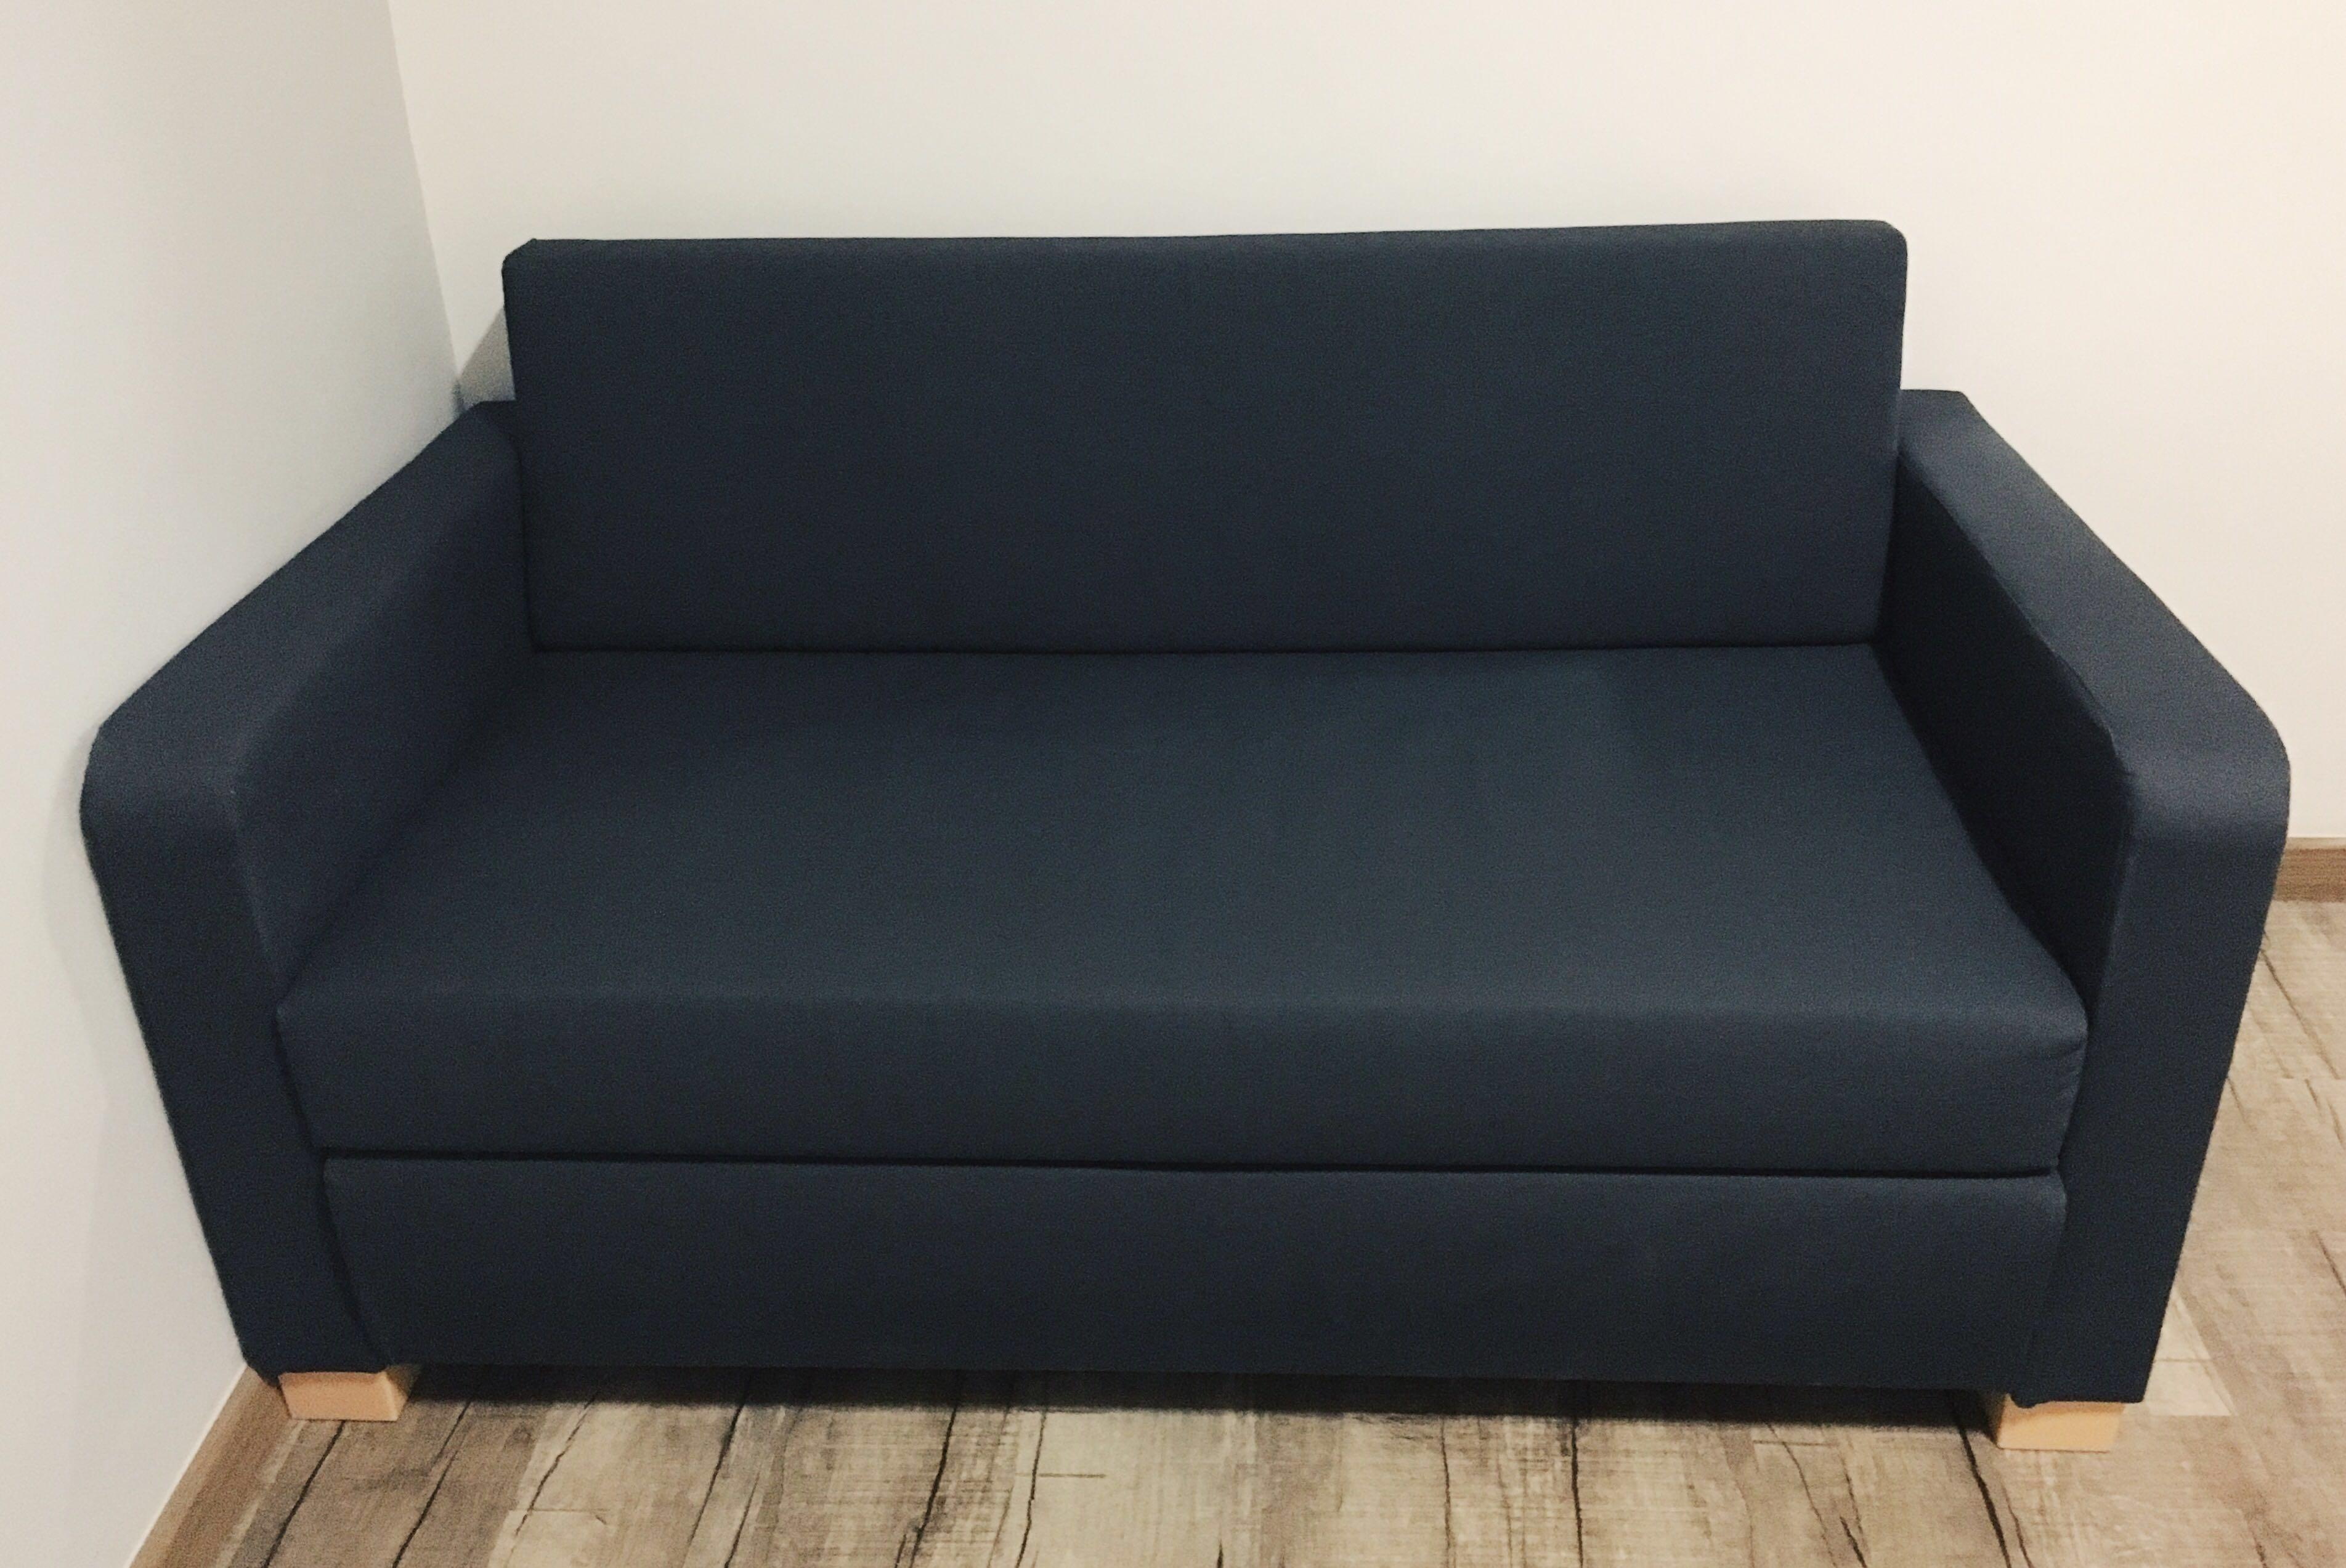 Ikea Solsta Sofa Bed Free Cushions Furniture Sofas On Carousell